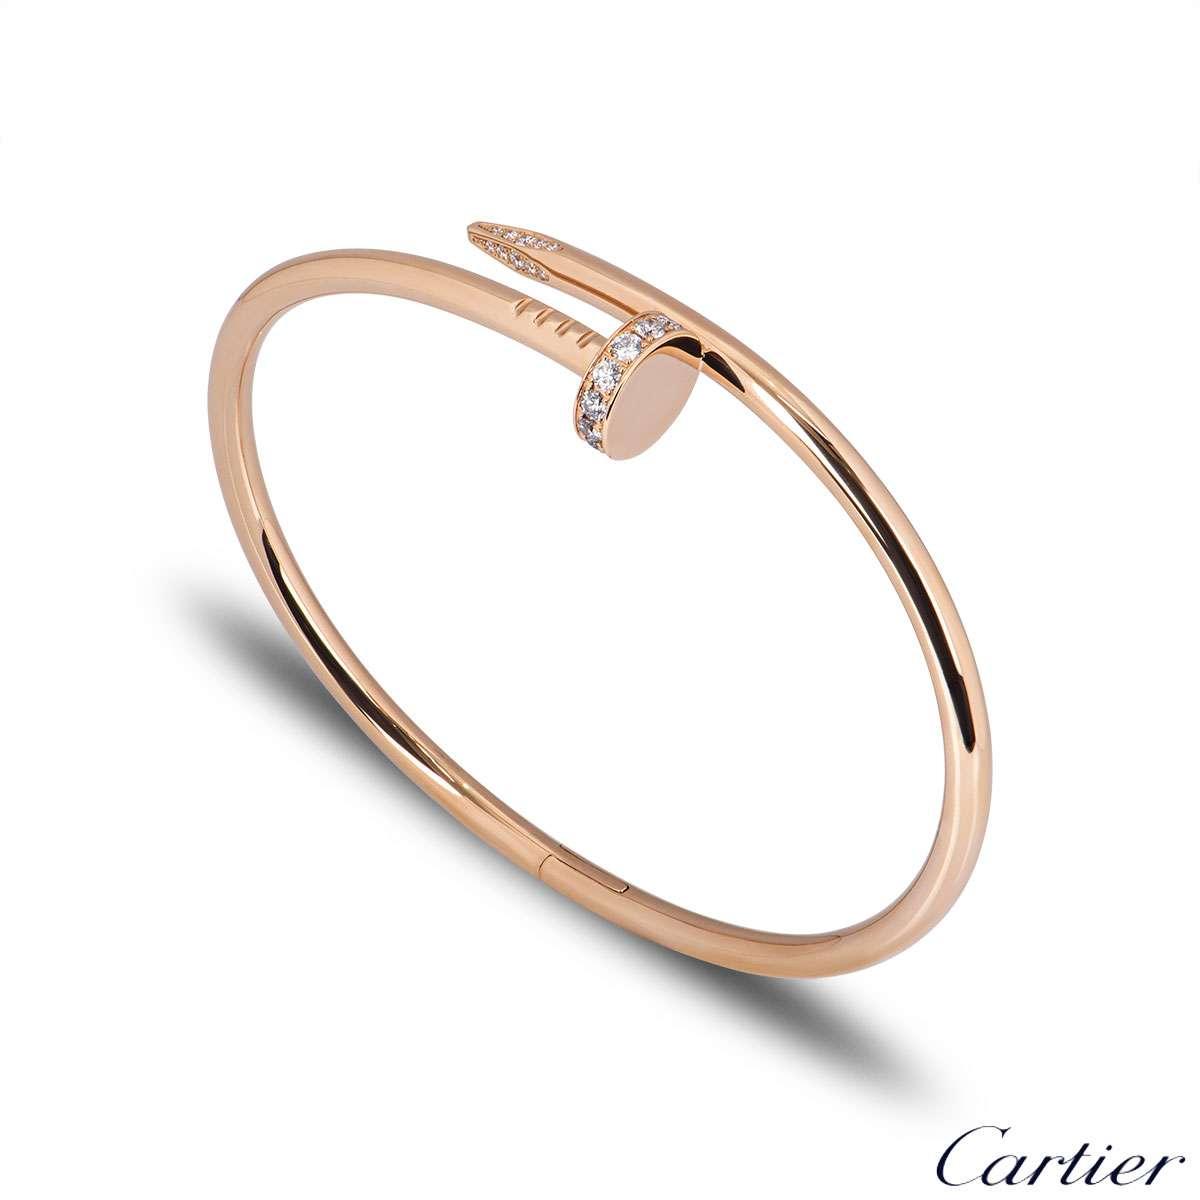 Cartier Rose Gold Diamond Juste Un Clou Bracelet Size 15 B6048515